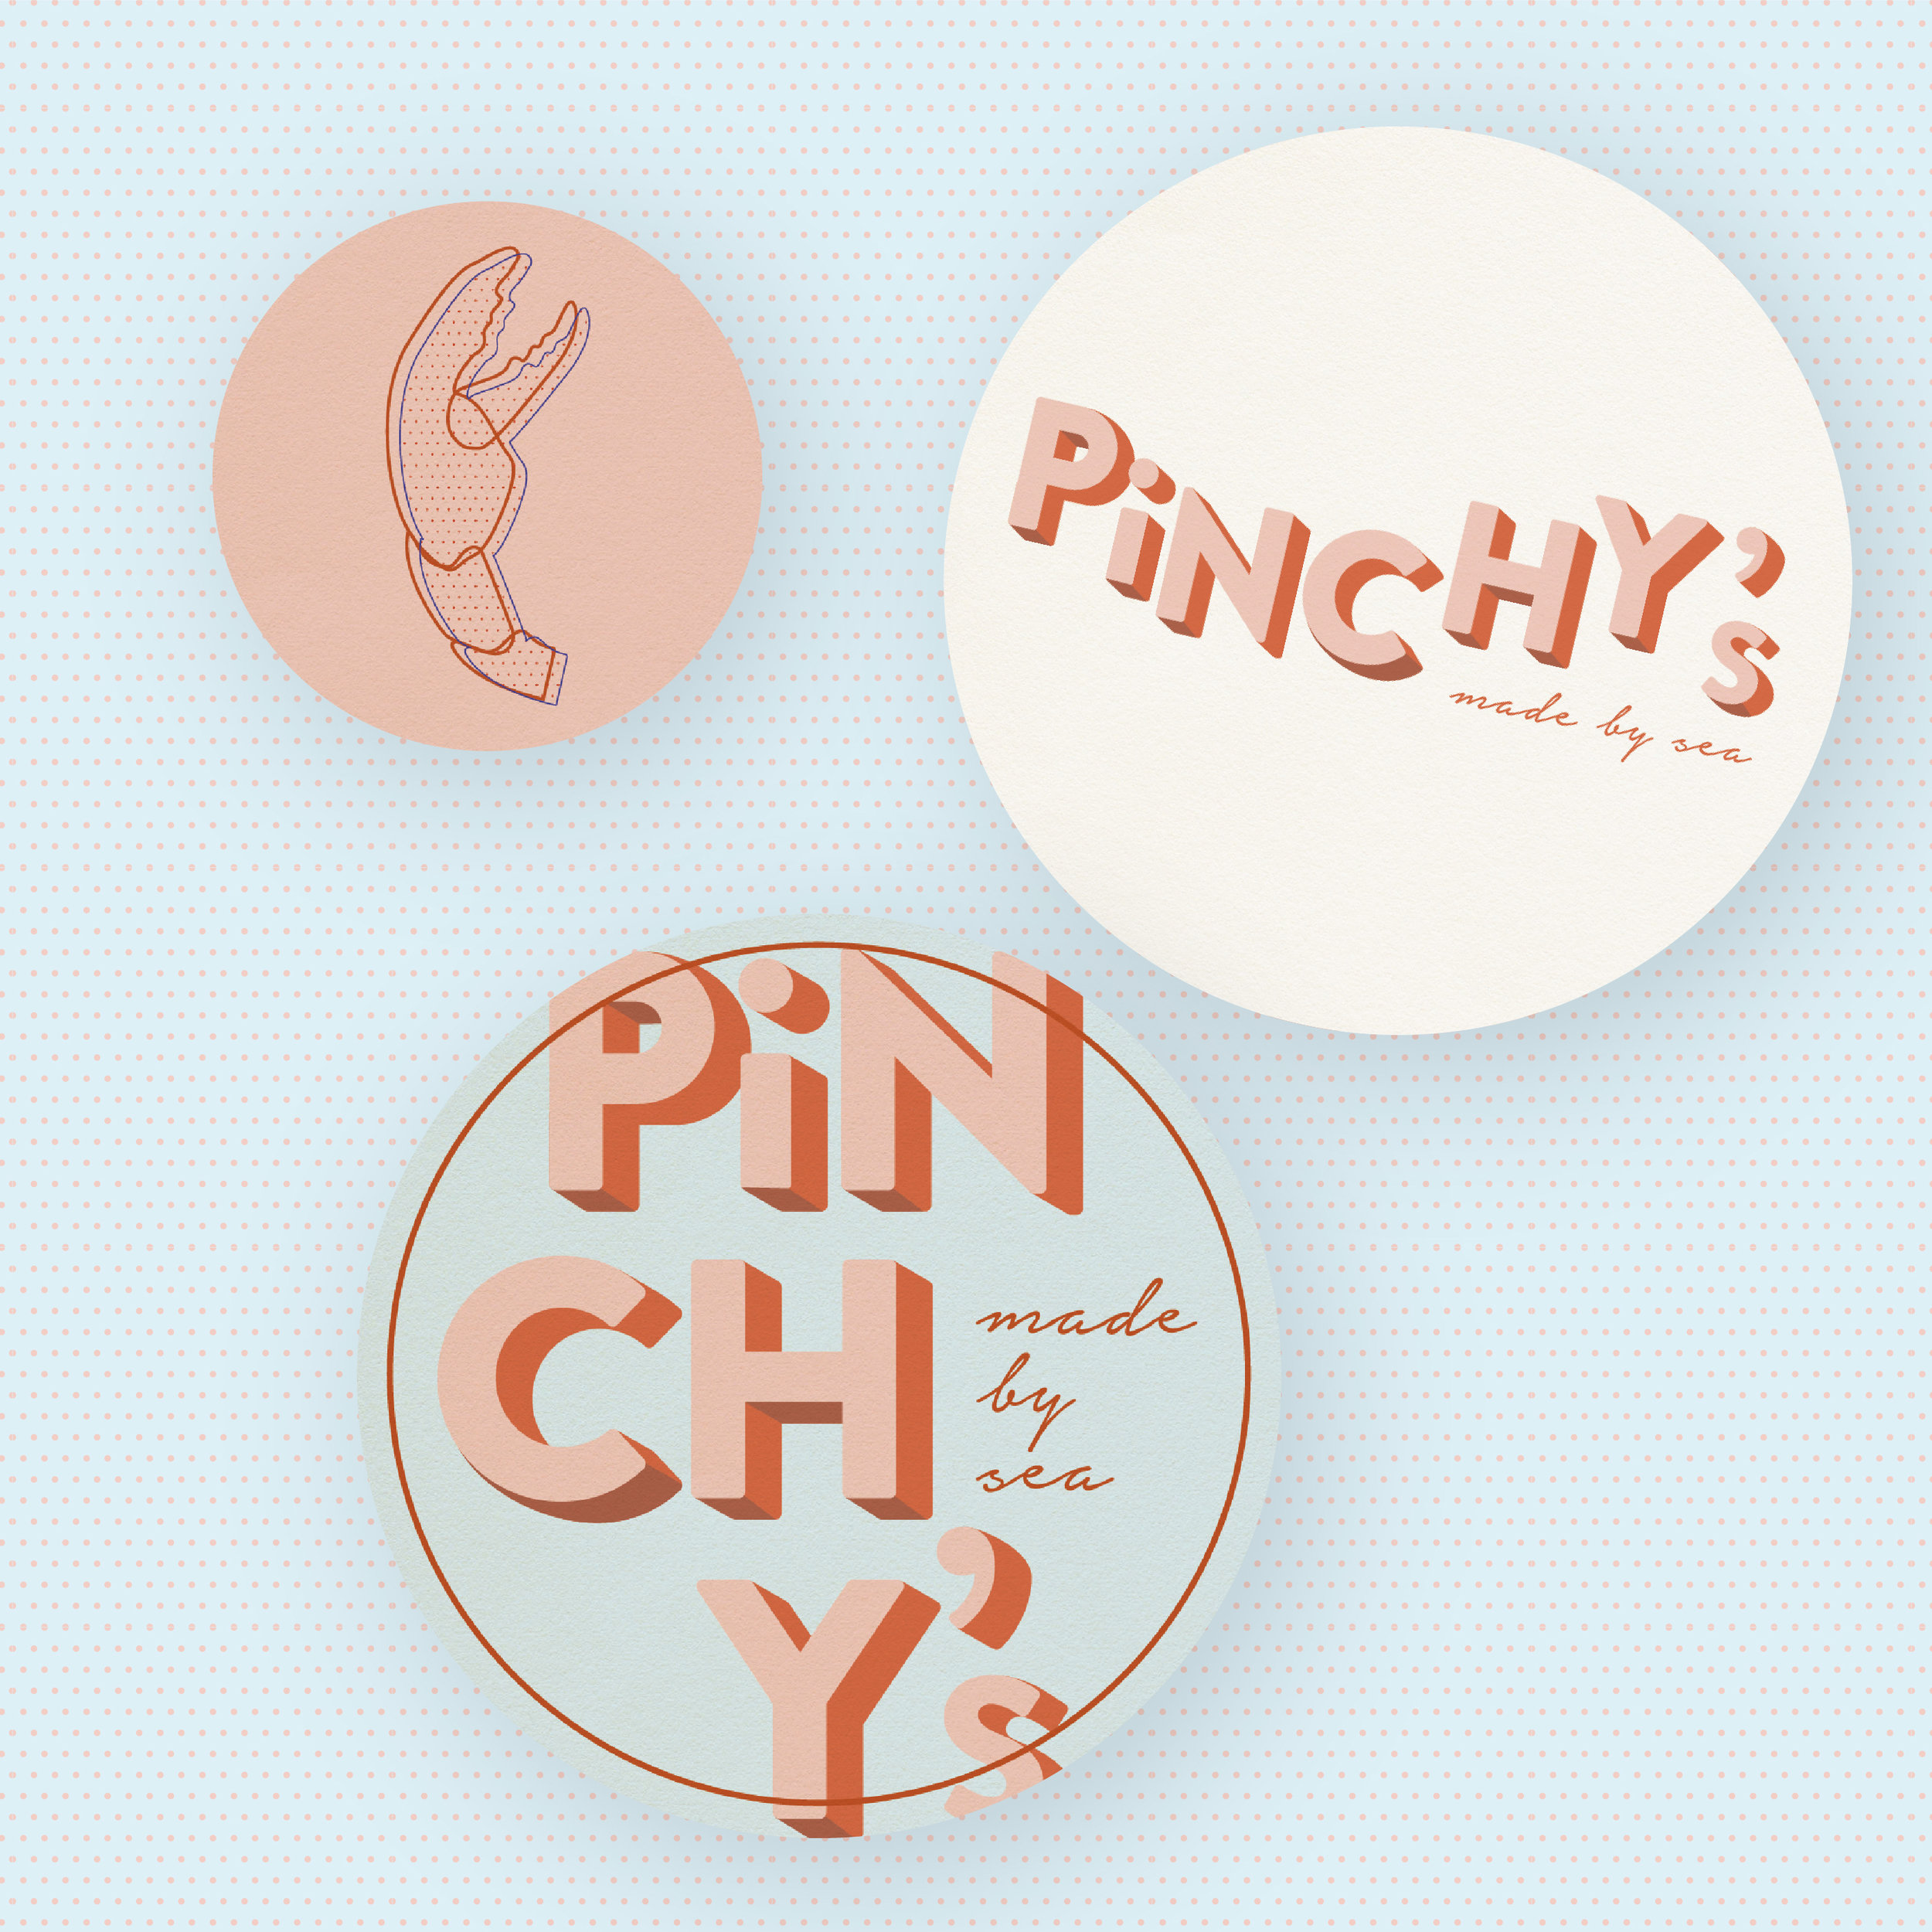 pinchys-11.jpg